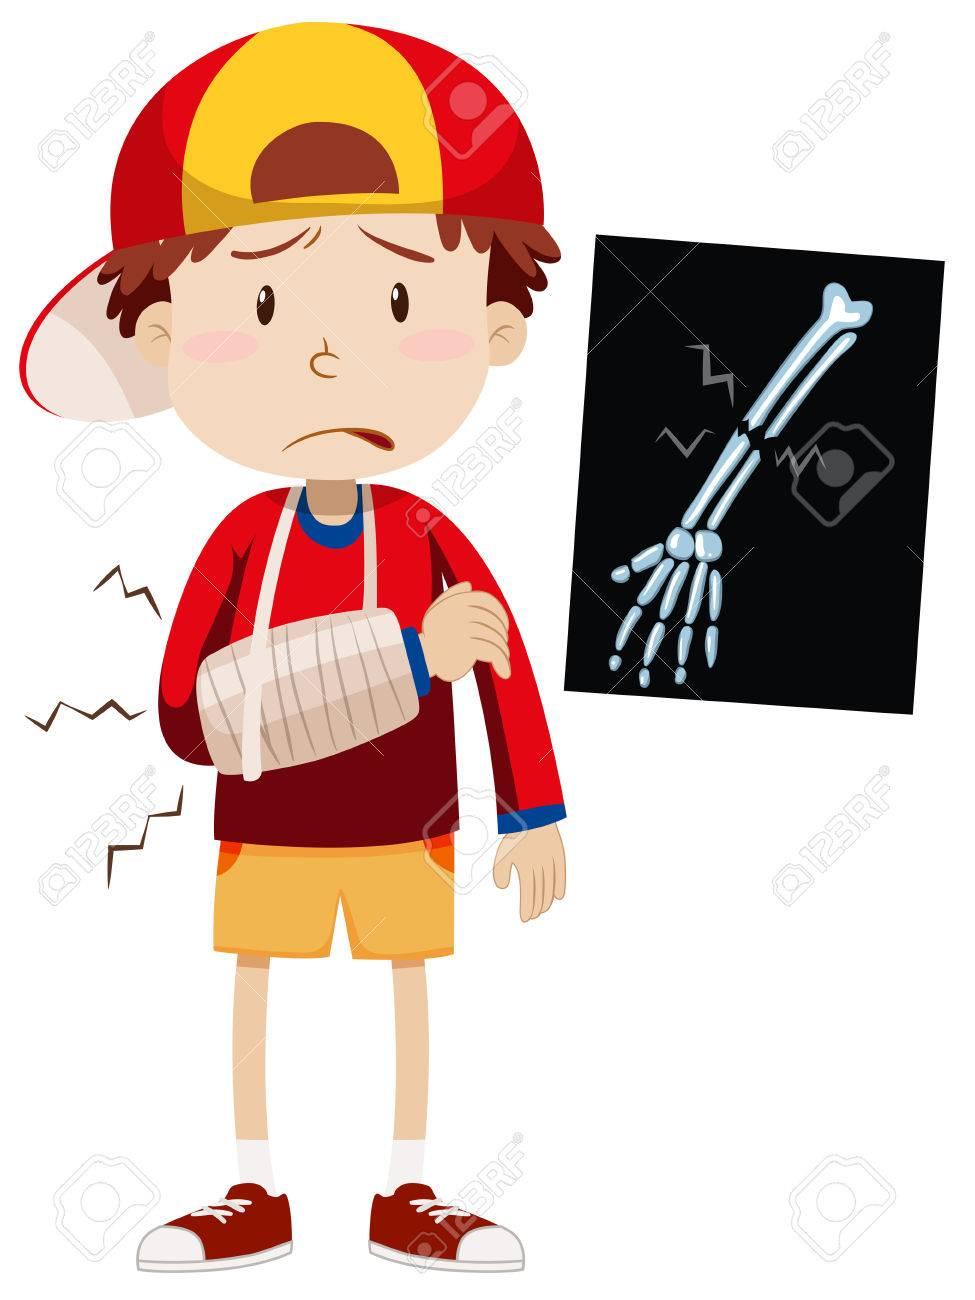 Sad boy with broken arm illustration.